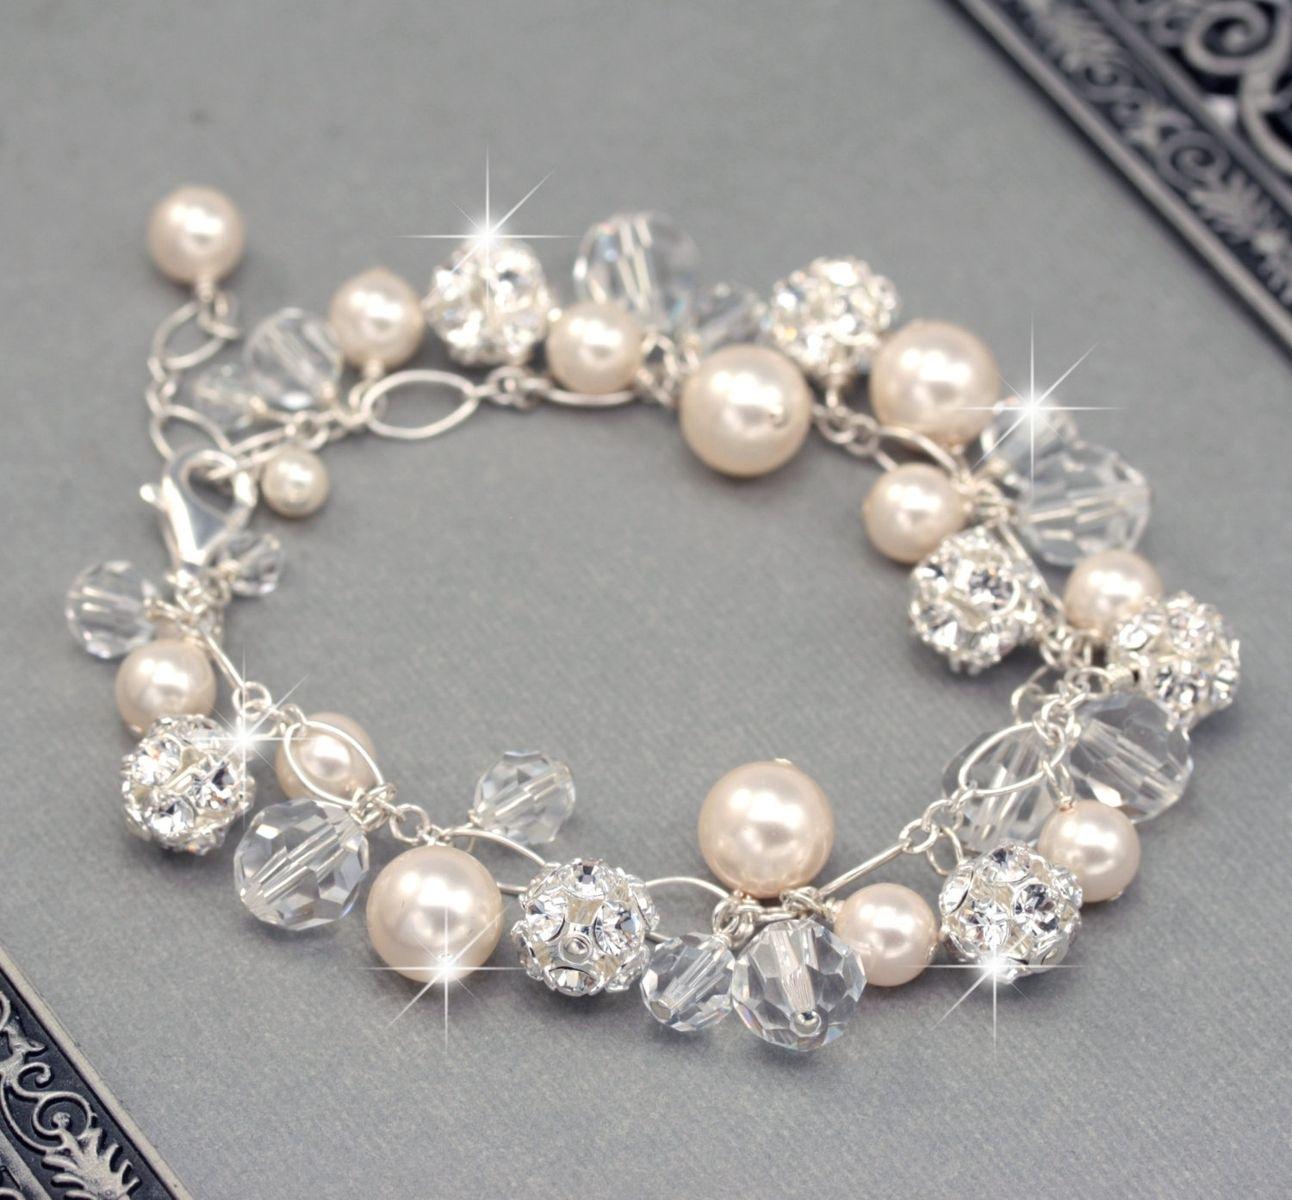 Swarovski Charm Bracelet: Buy Hand Crafted Bridal Bracelet